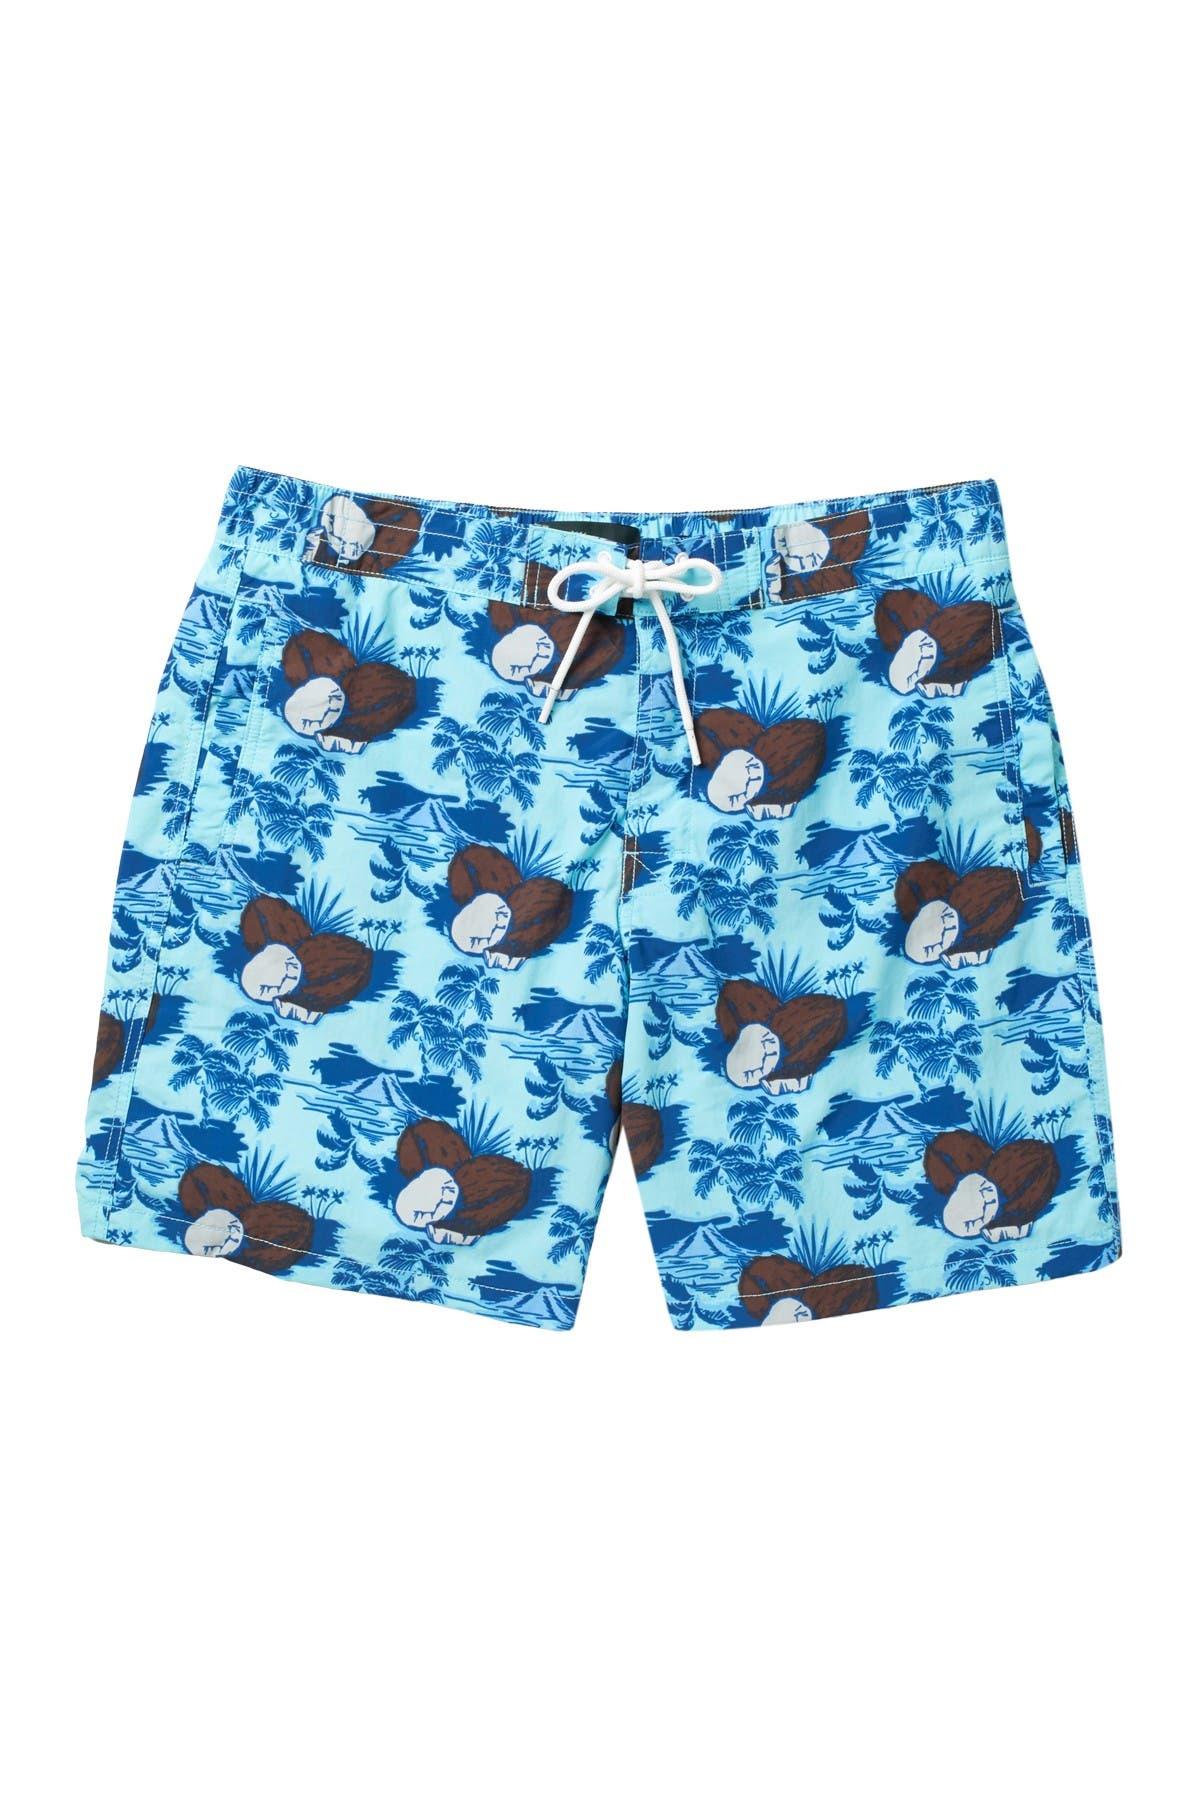 Image of RODD AND GUNN Topical Print Swim Shorts